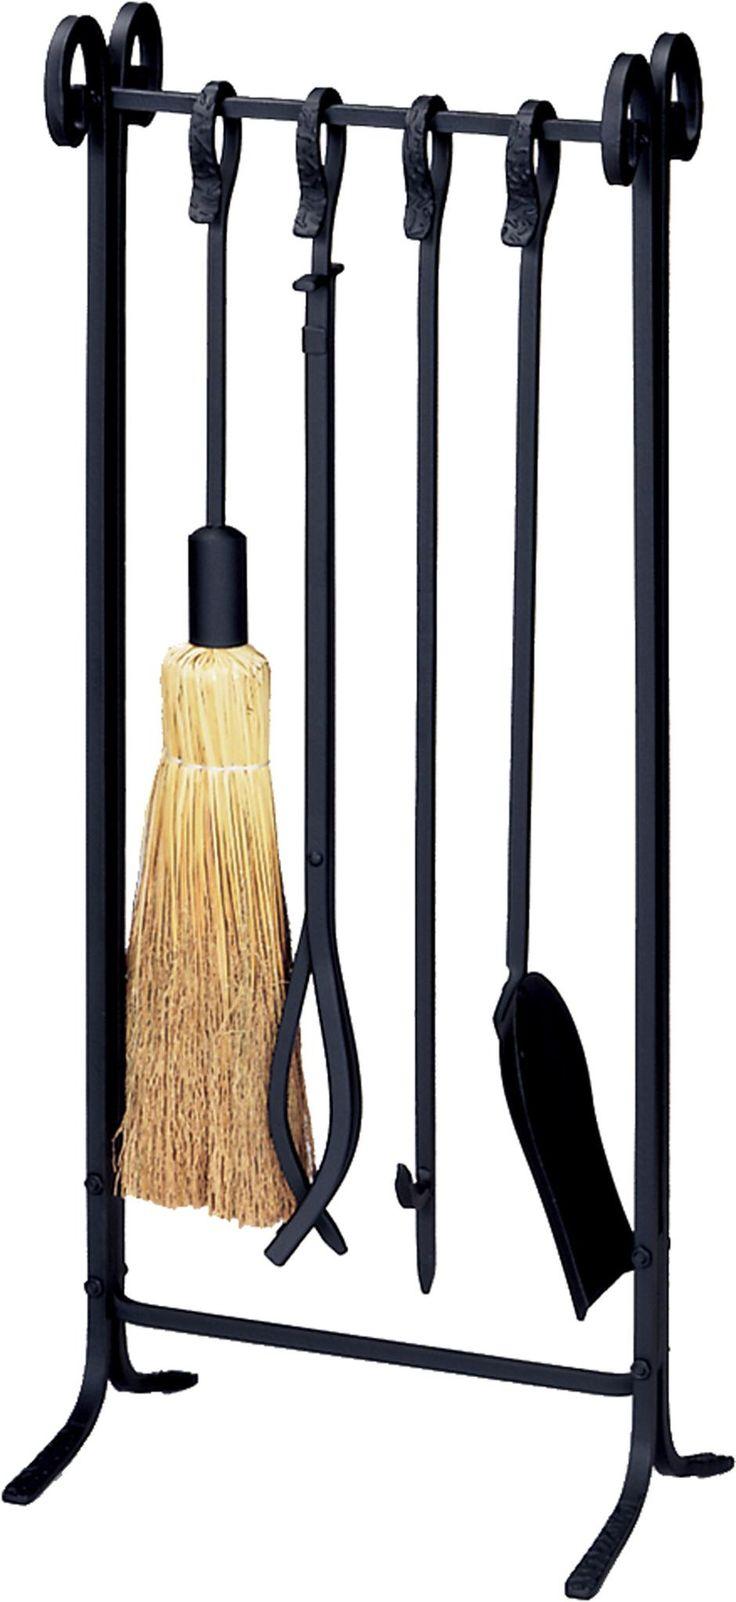 die besten 25 traditional fireplace tools ideen auf pinterest